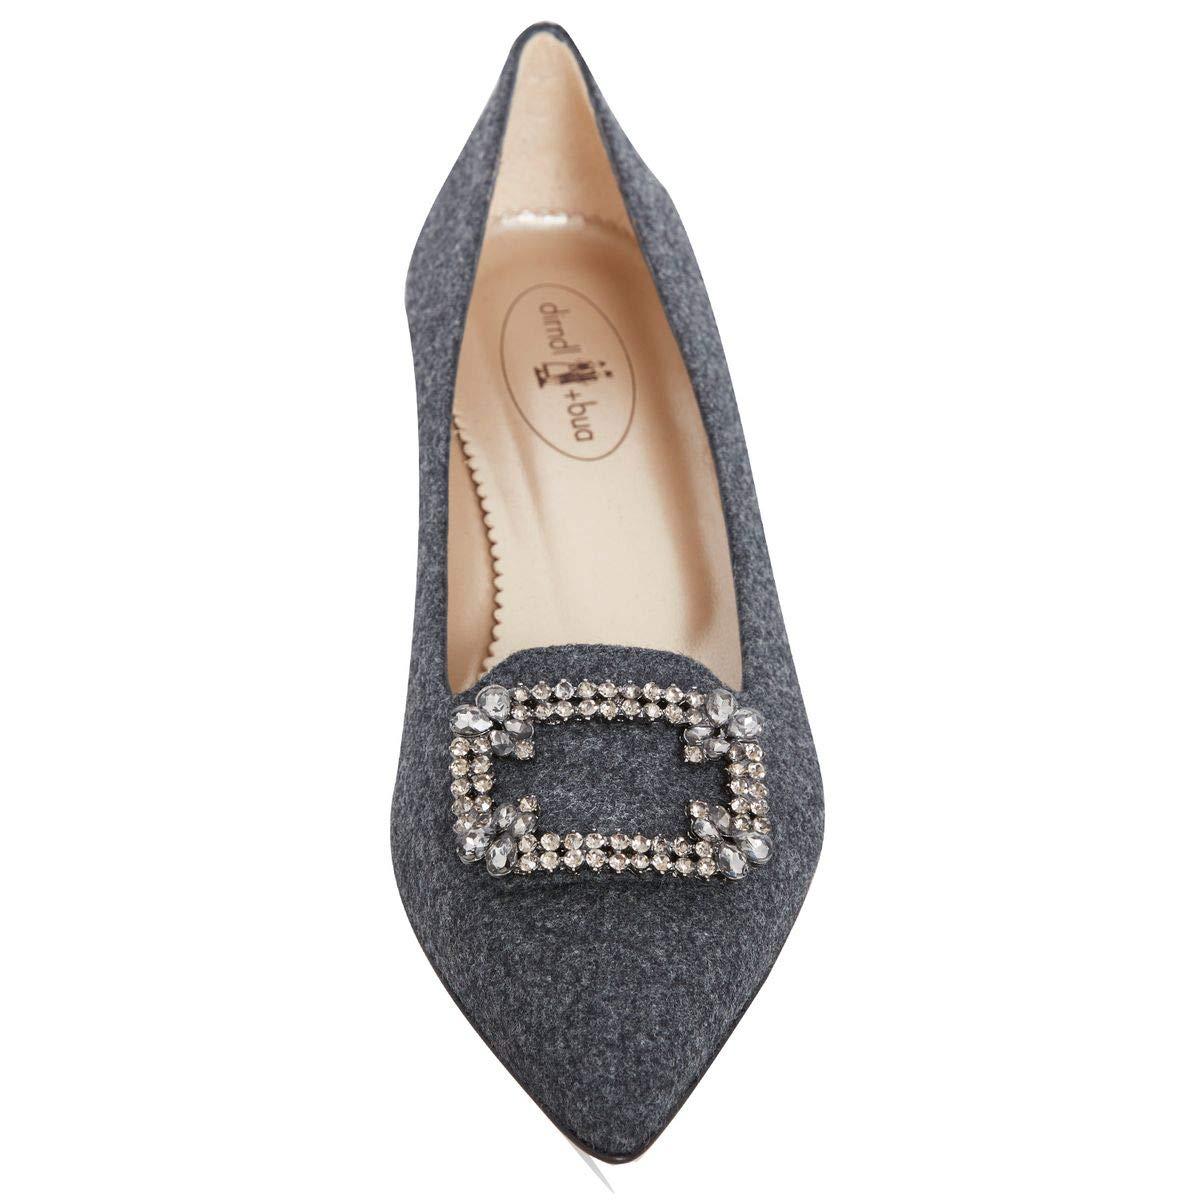 e5bbaec240751b dirndl + bua Damen Dirndl-Schuhe Ballerinas Sabine in Grau Trachten-Schuhe:  Amazon.de: Schuhe & Handtaschen